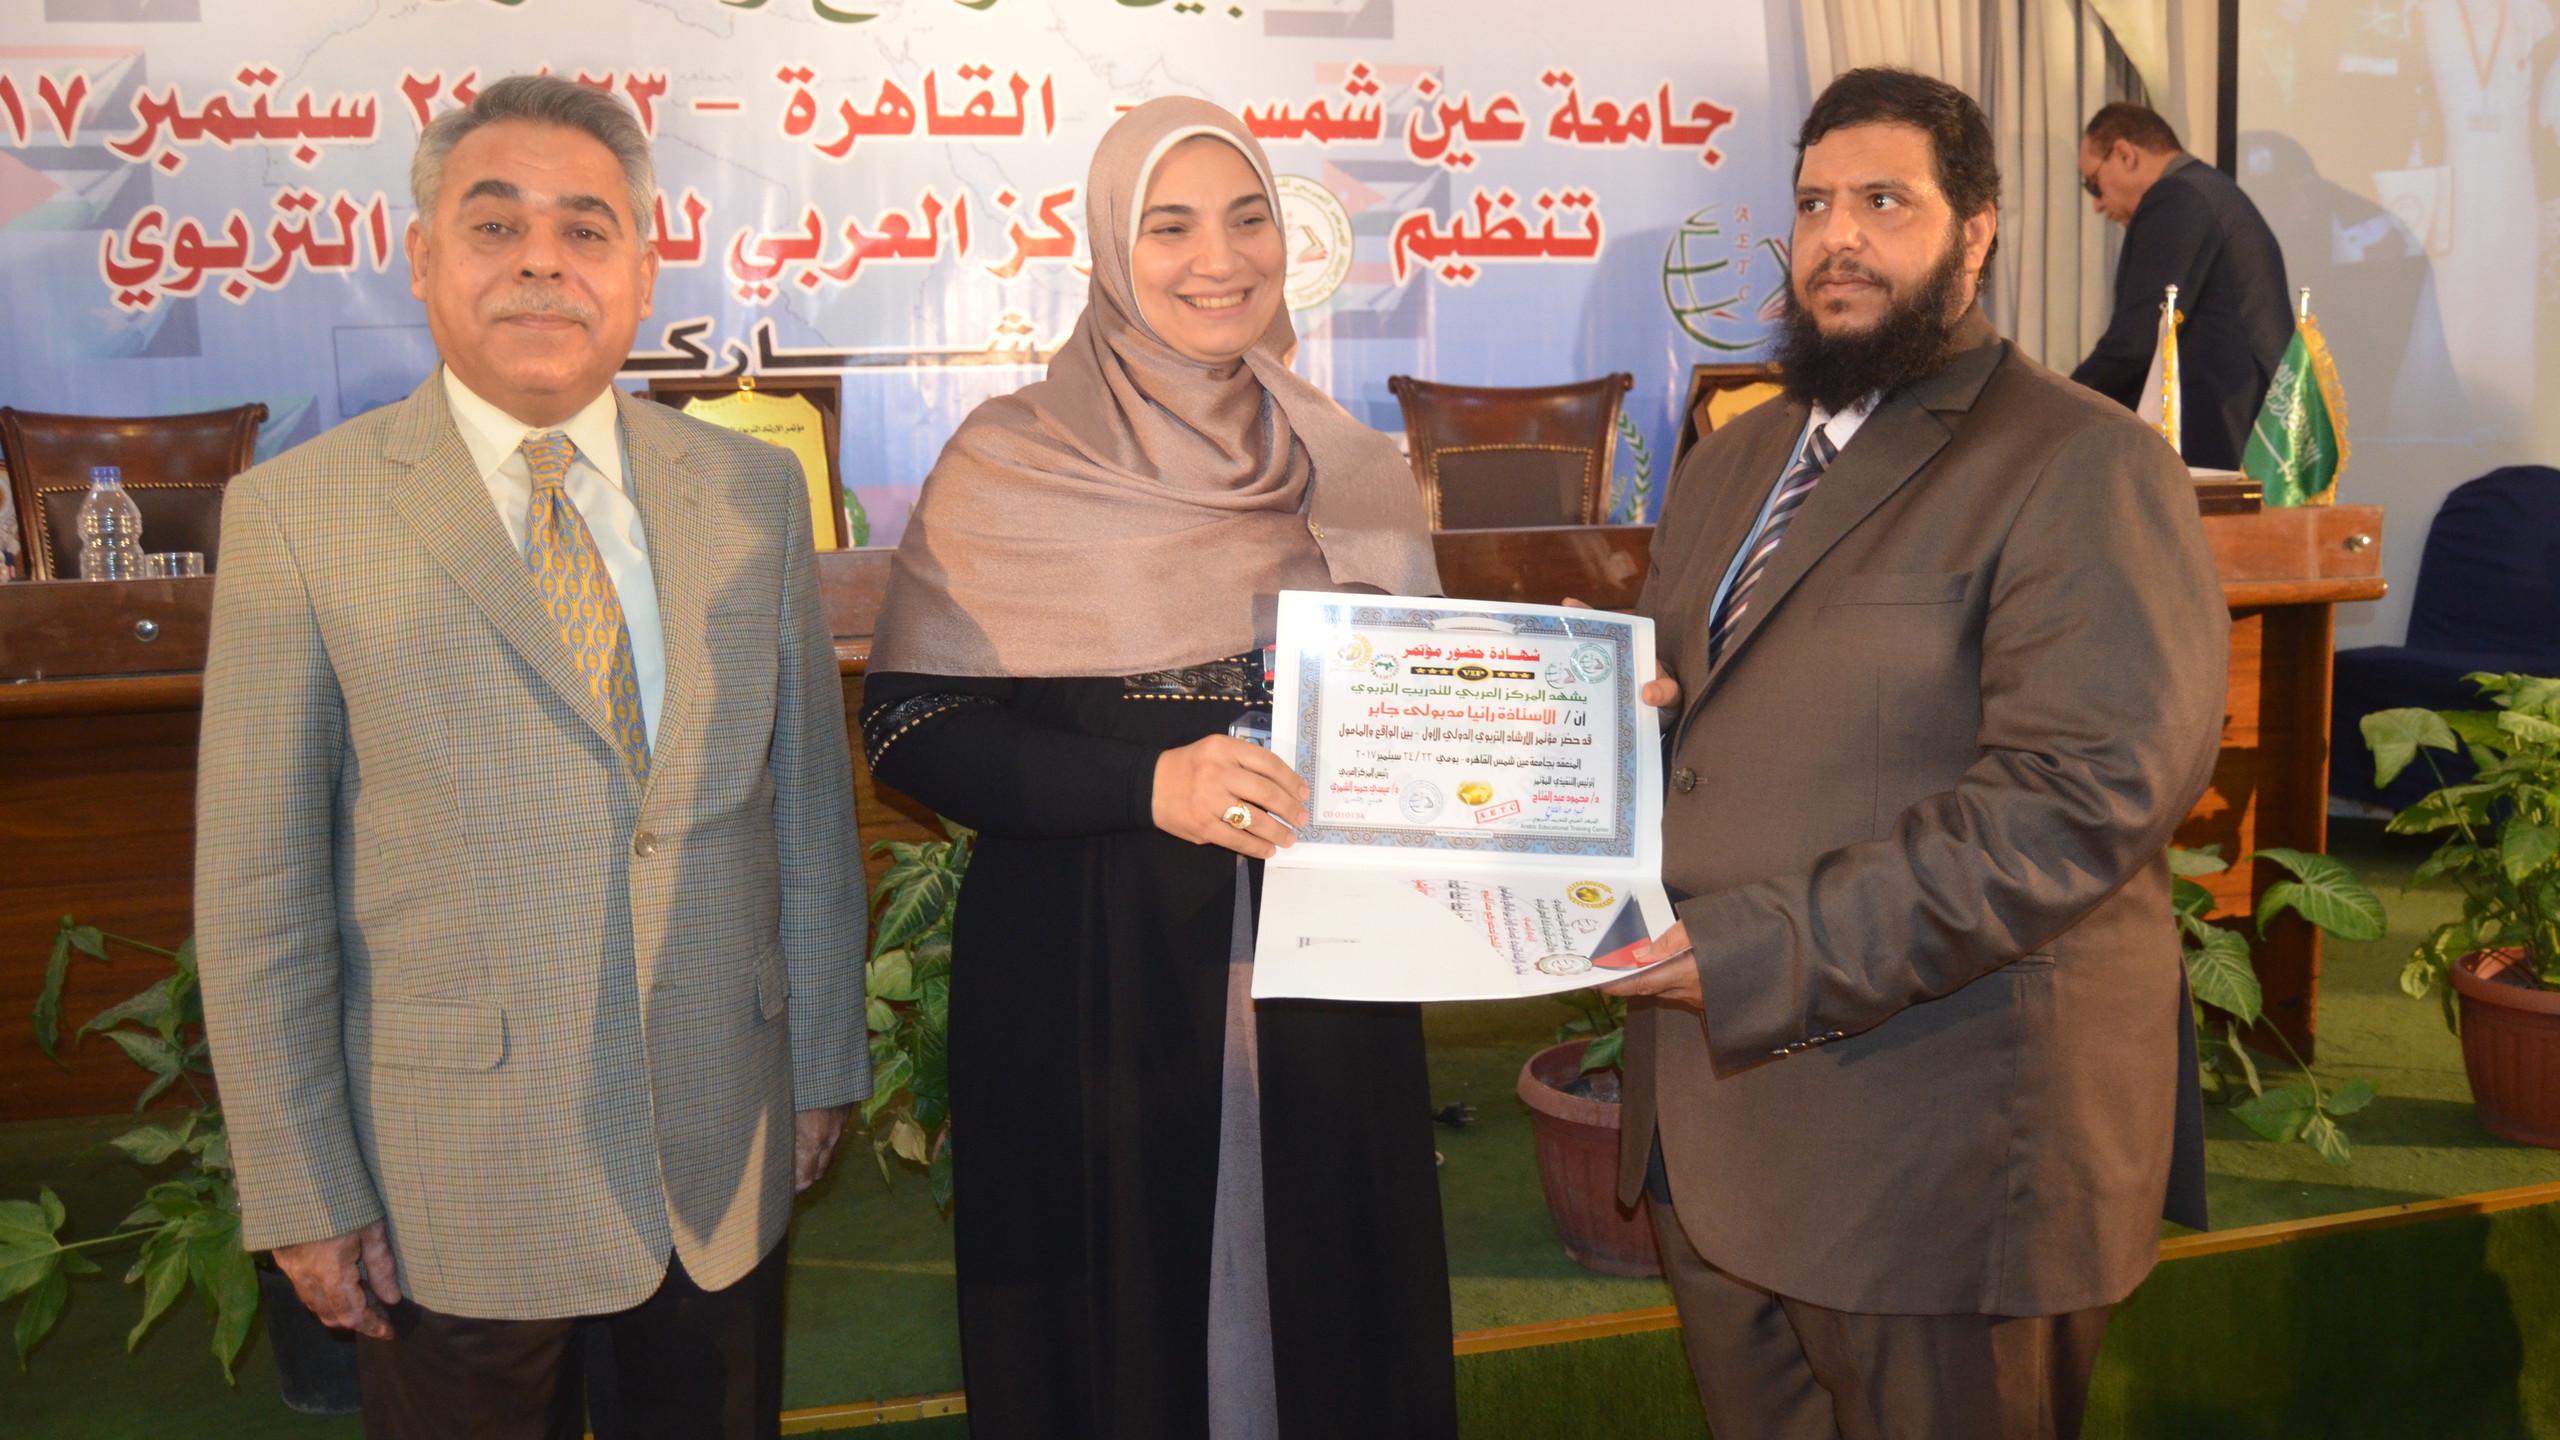 AACID Patronage Ain Shams University